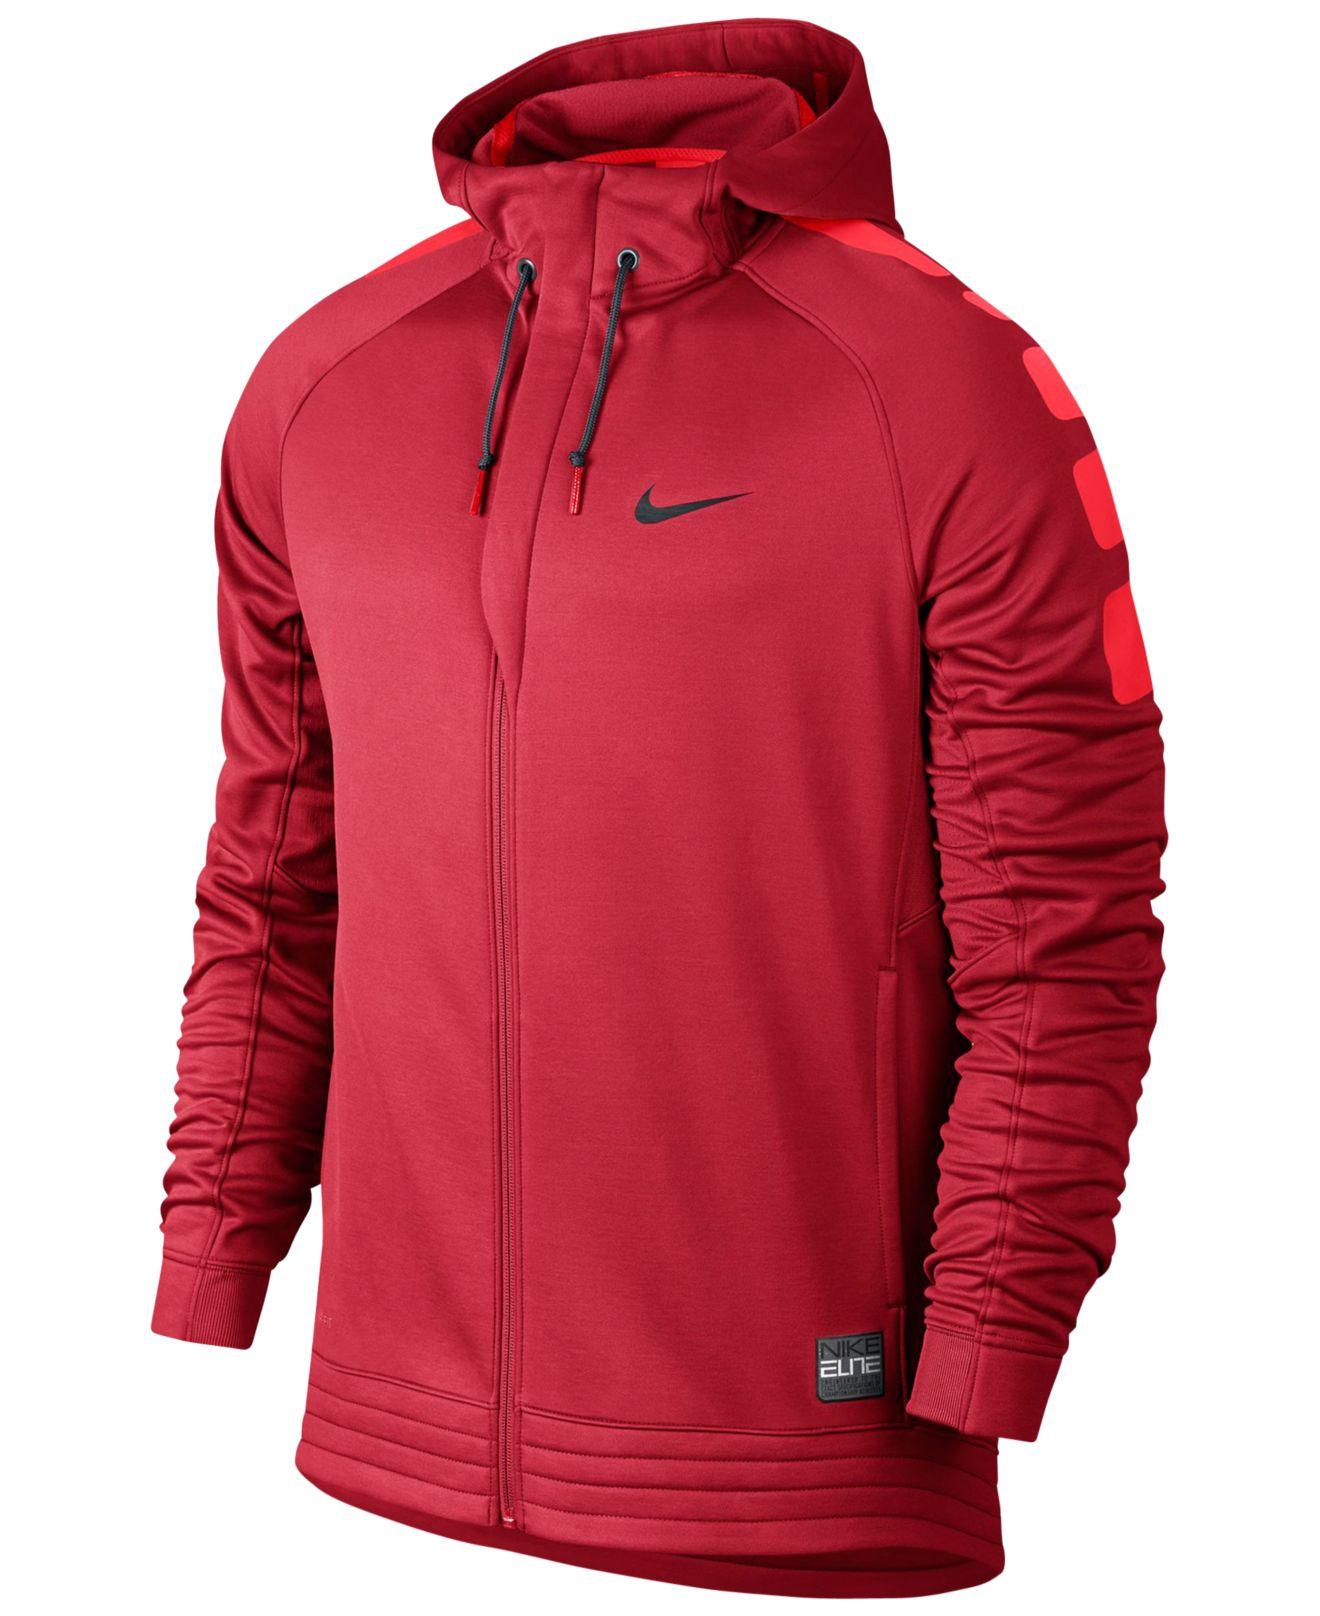 Nike red elite striped full zip basketball hoodie for - Hm herren jeans ...